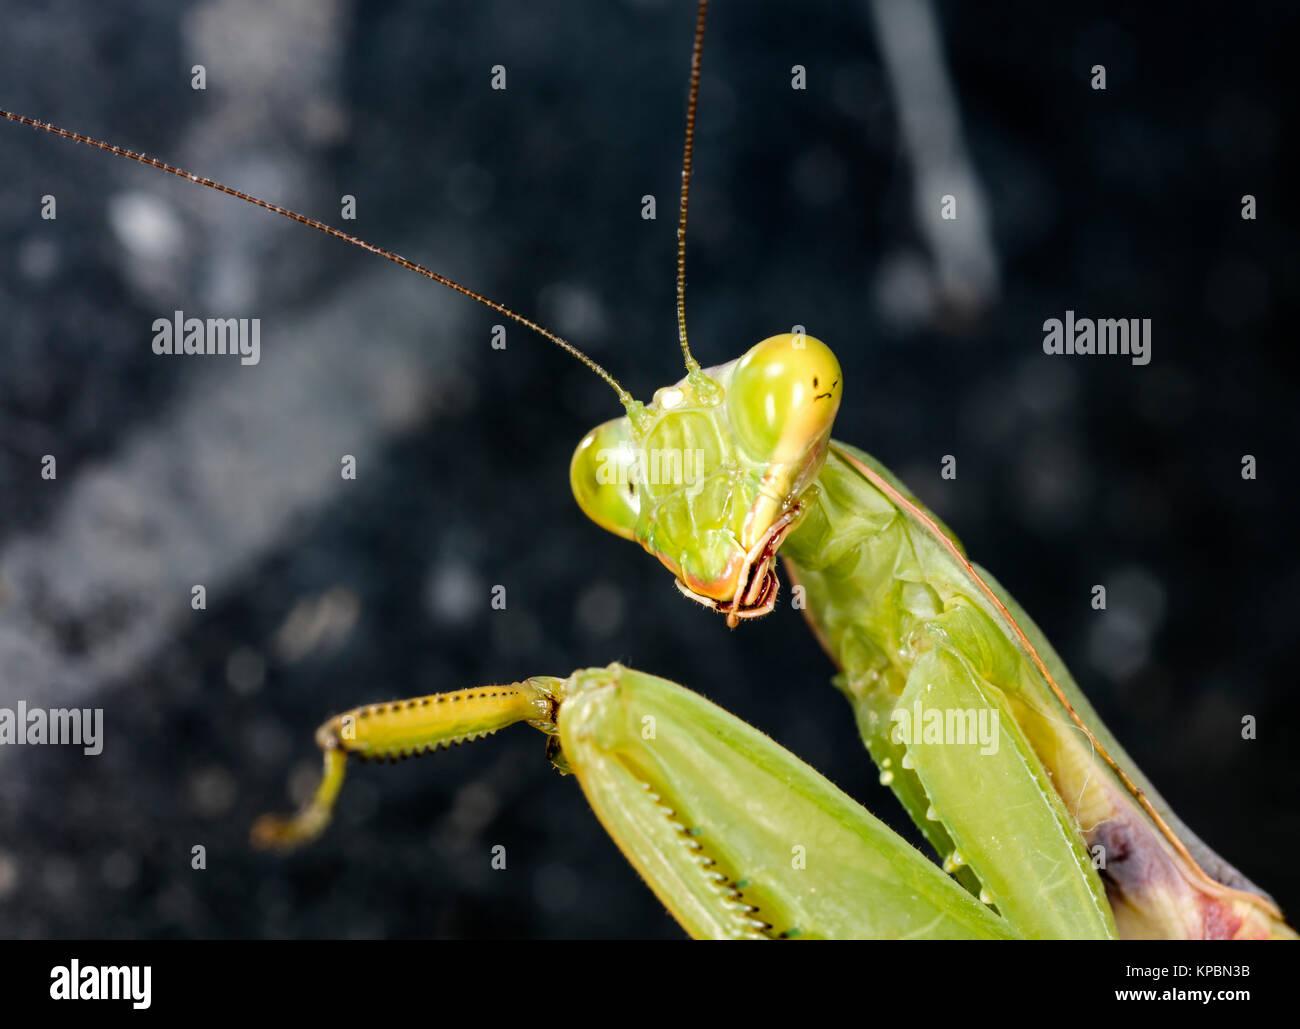 large female of the mantis - Stock Image